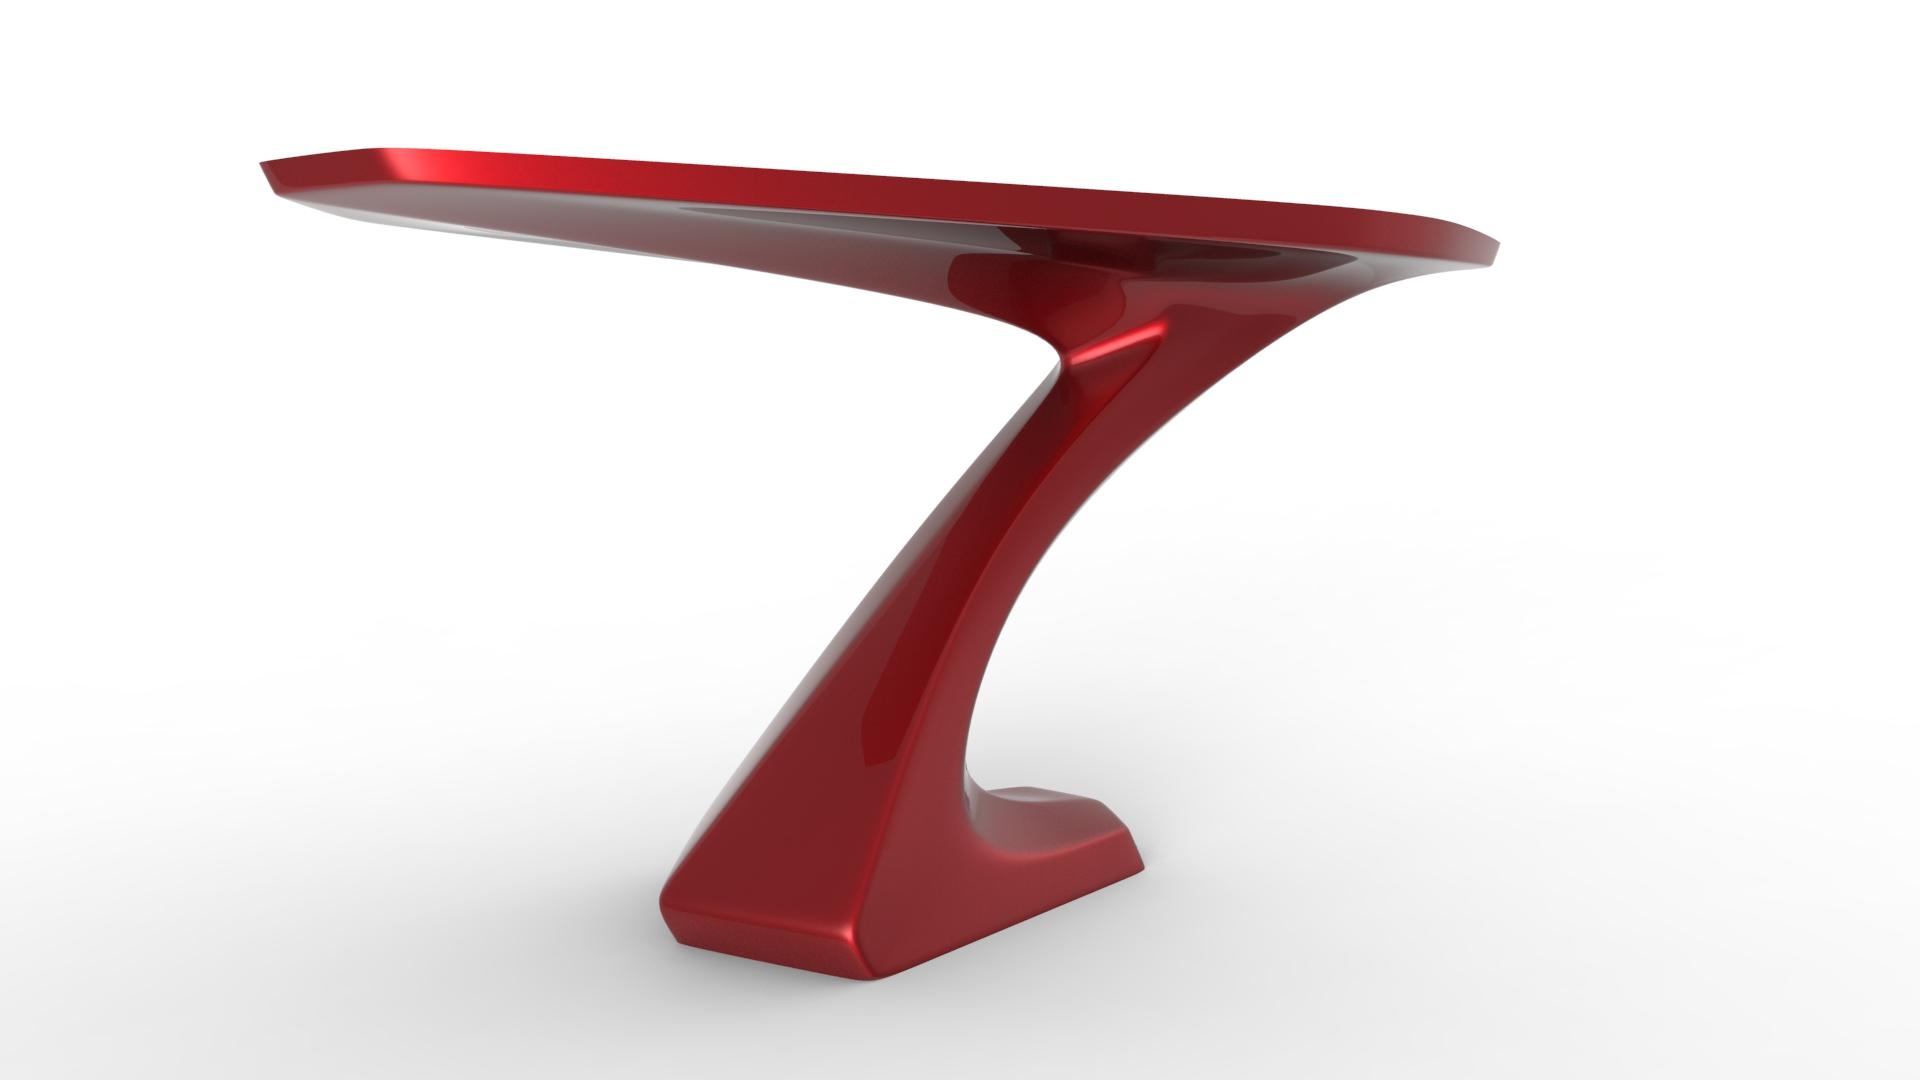 ztable-asteriskos-organic-maya-table-fabrication-modern-foam-furniture-render-keyshot-cherry-carpaint.jpg